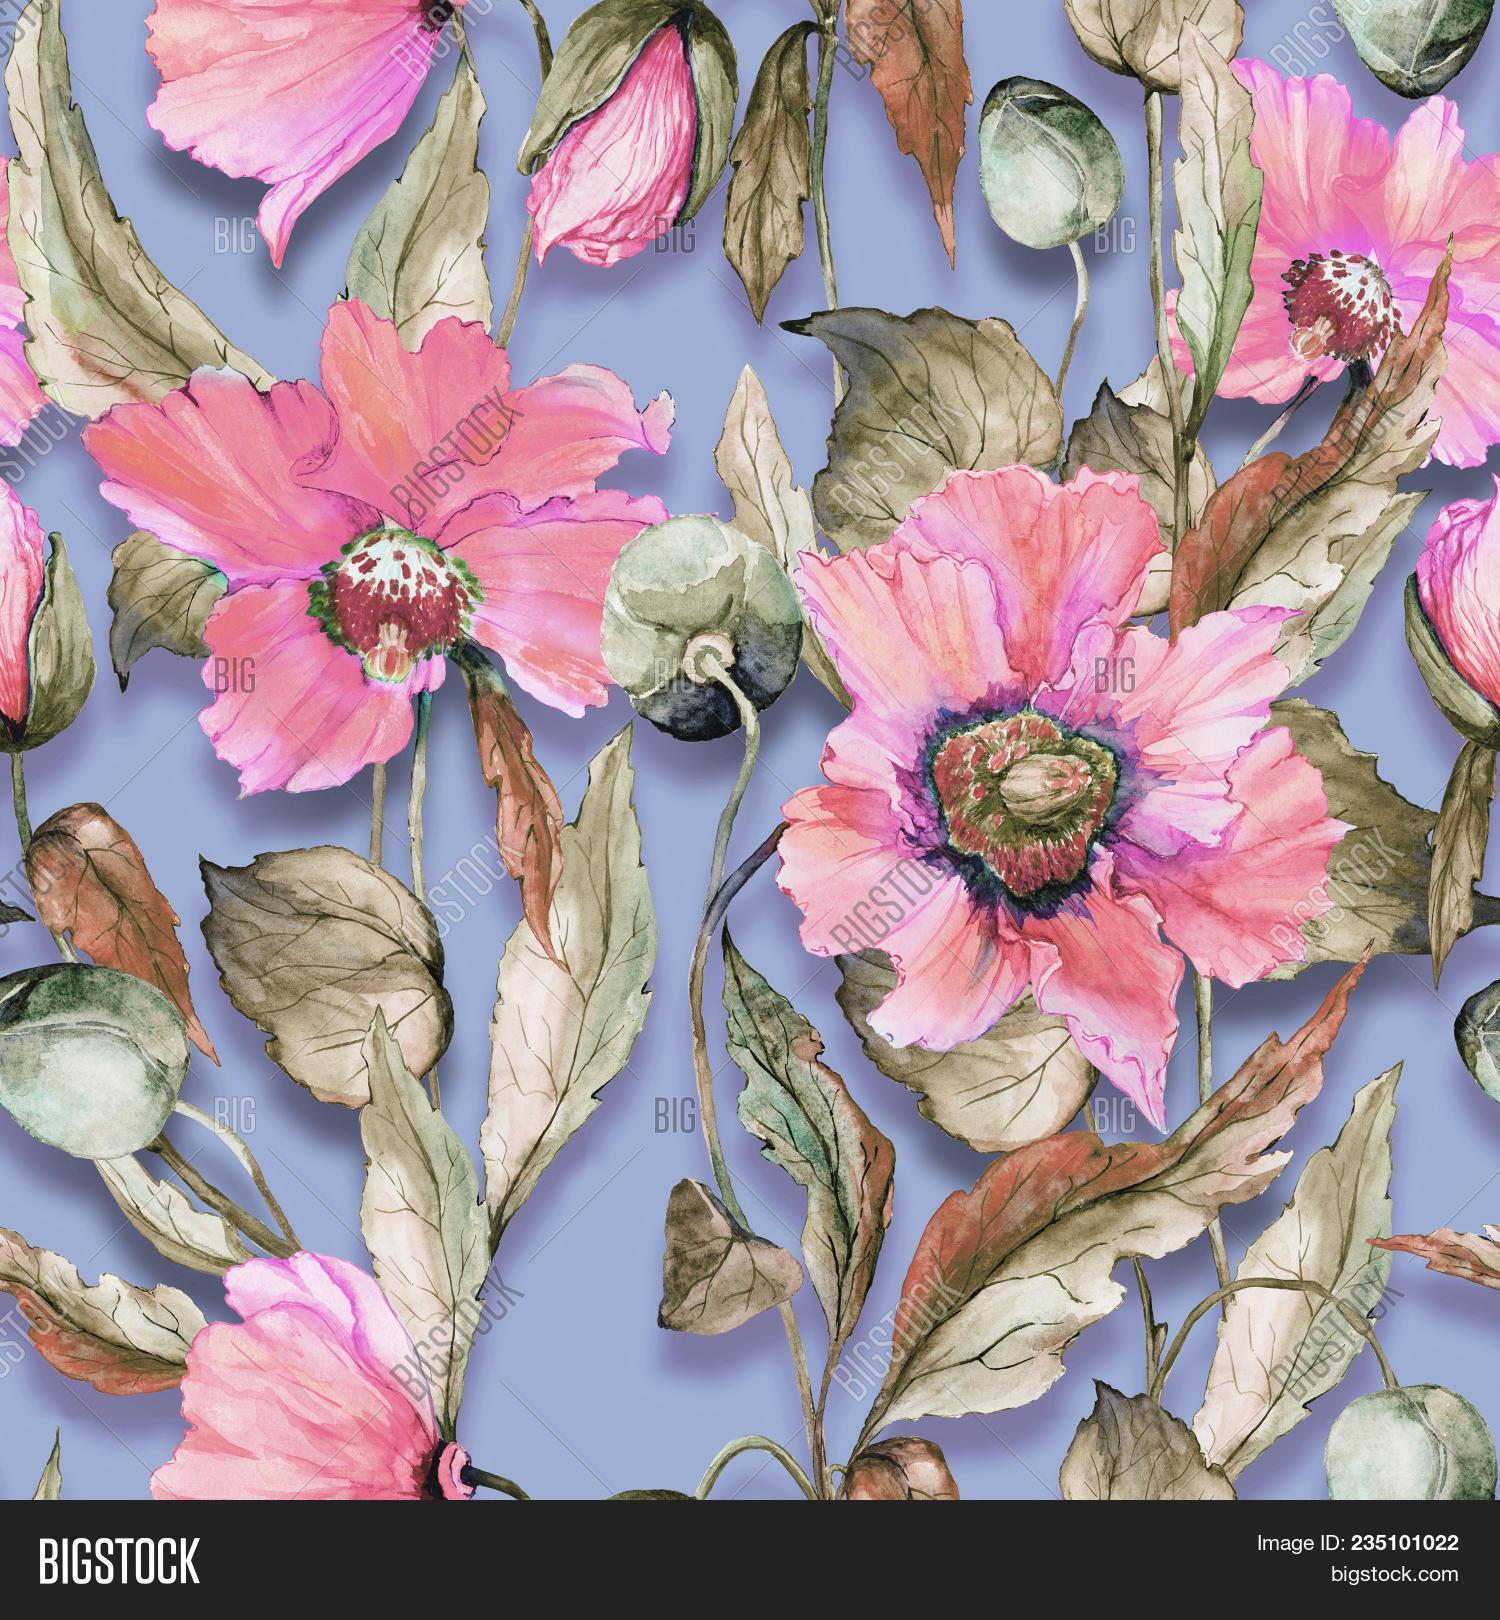 Beautiful Pink Poppy Image Photo Free Trial Bigstock